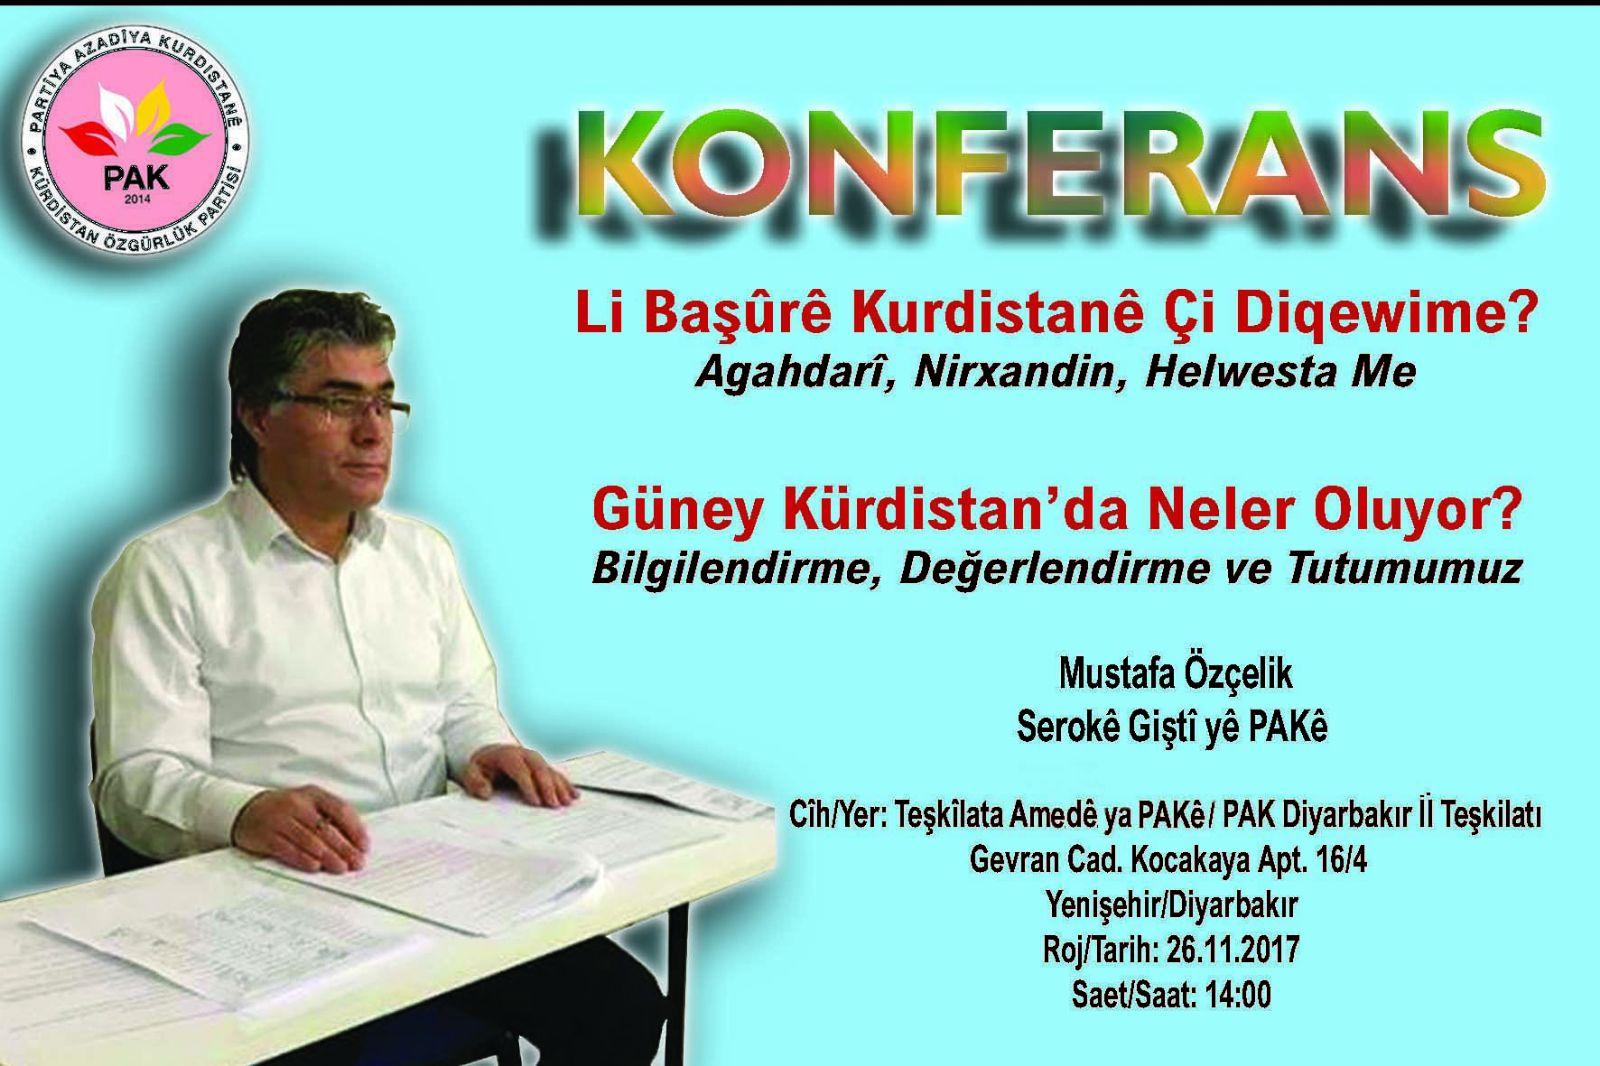 Diyarbakır'da Konferans